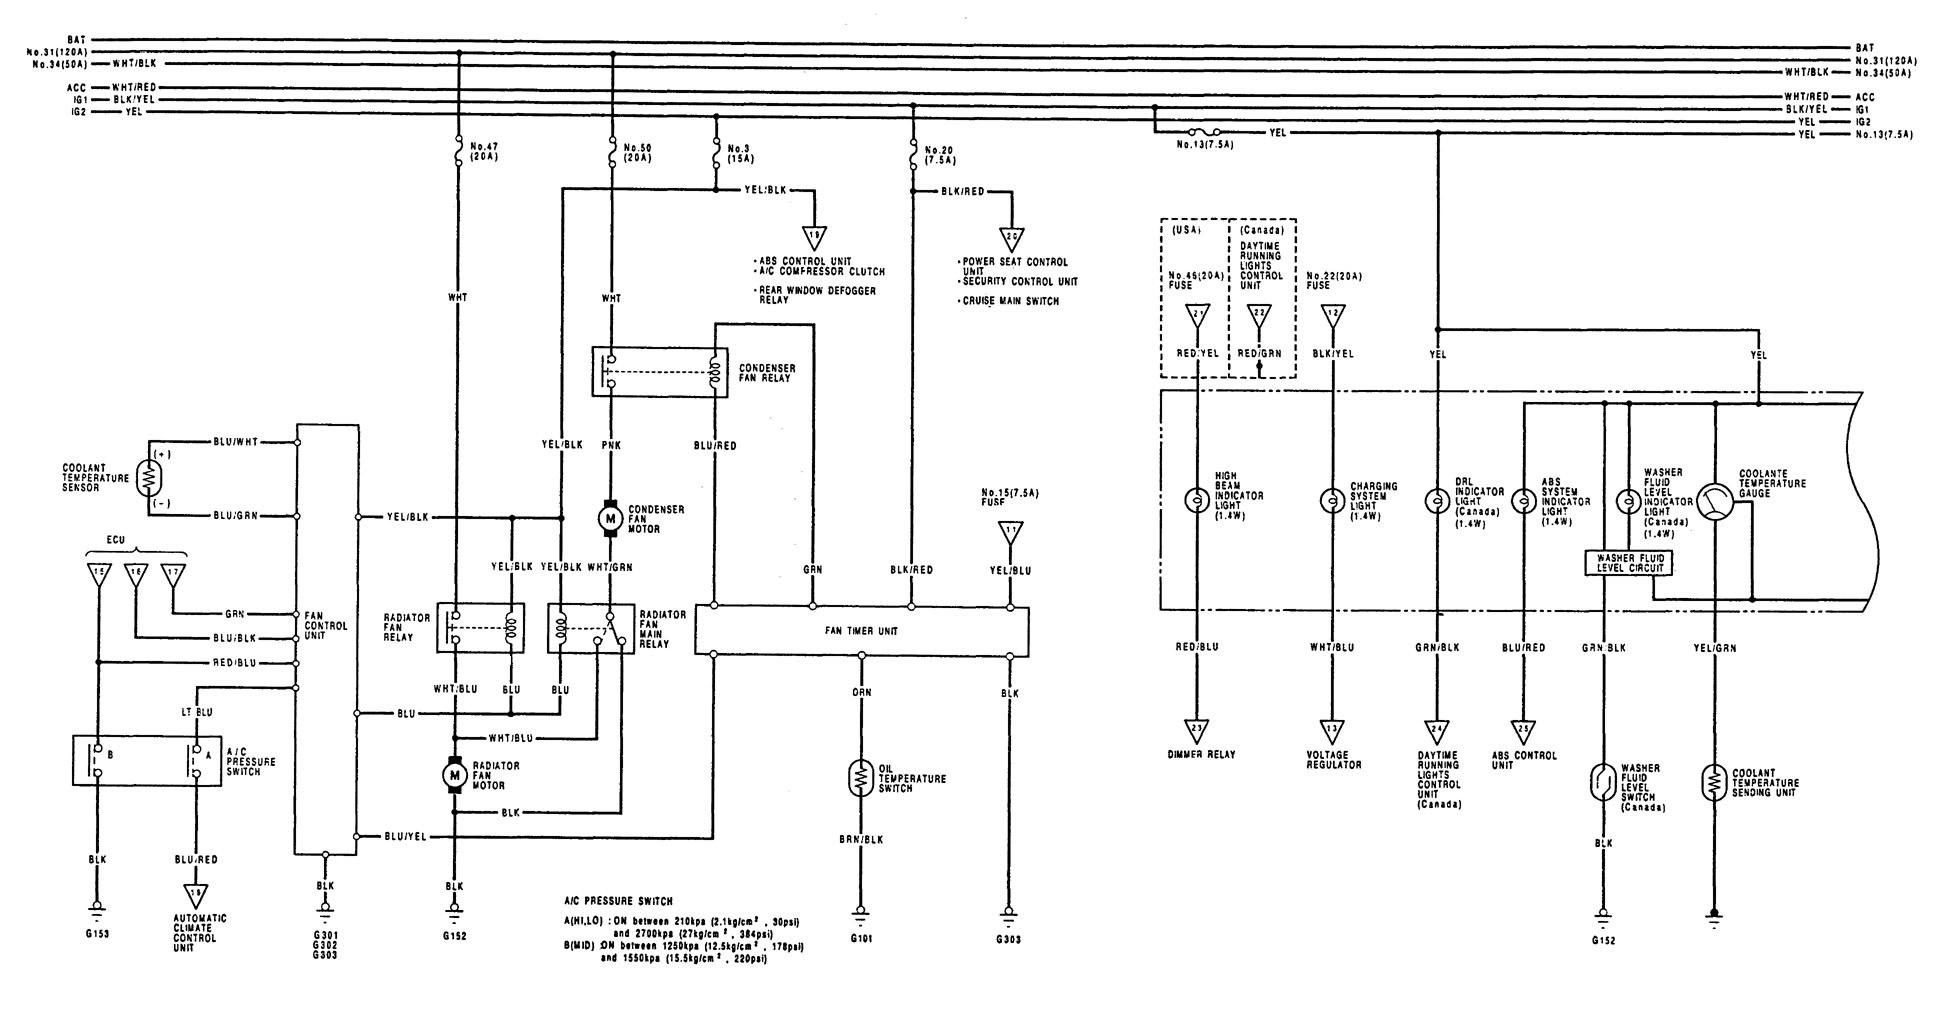 acura legend  1992 - 1993  - wiring diagrams - instrumentation